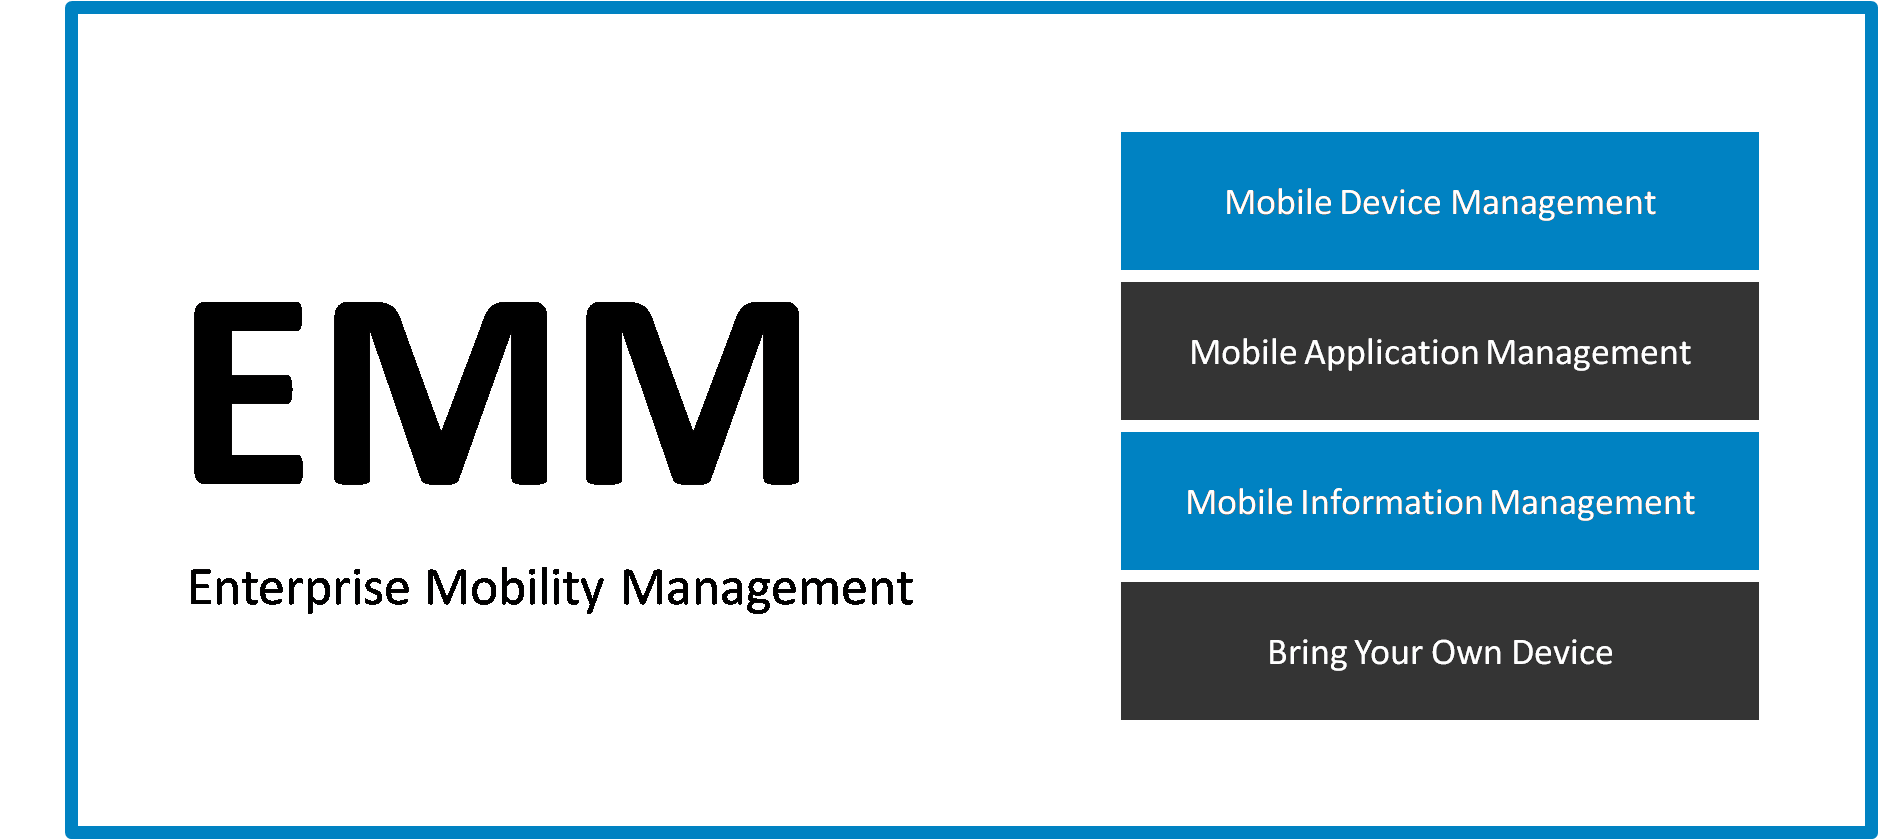 Enterprise Mobility Management (EMM)